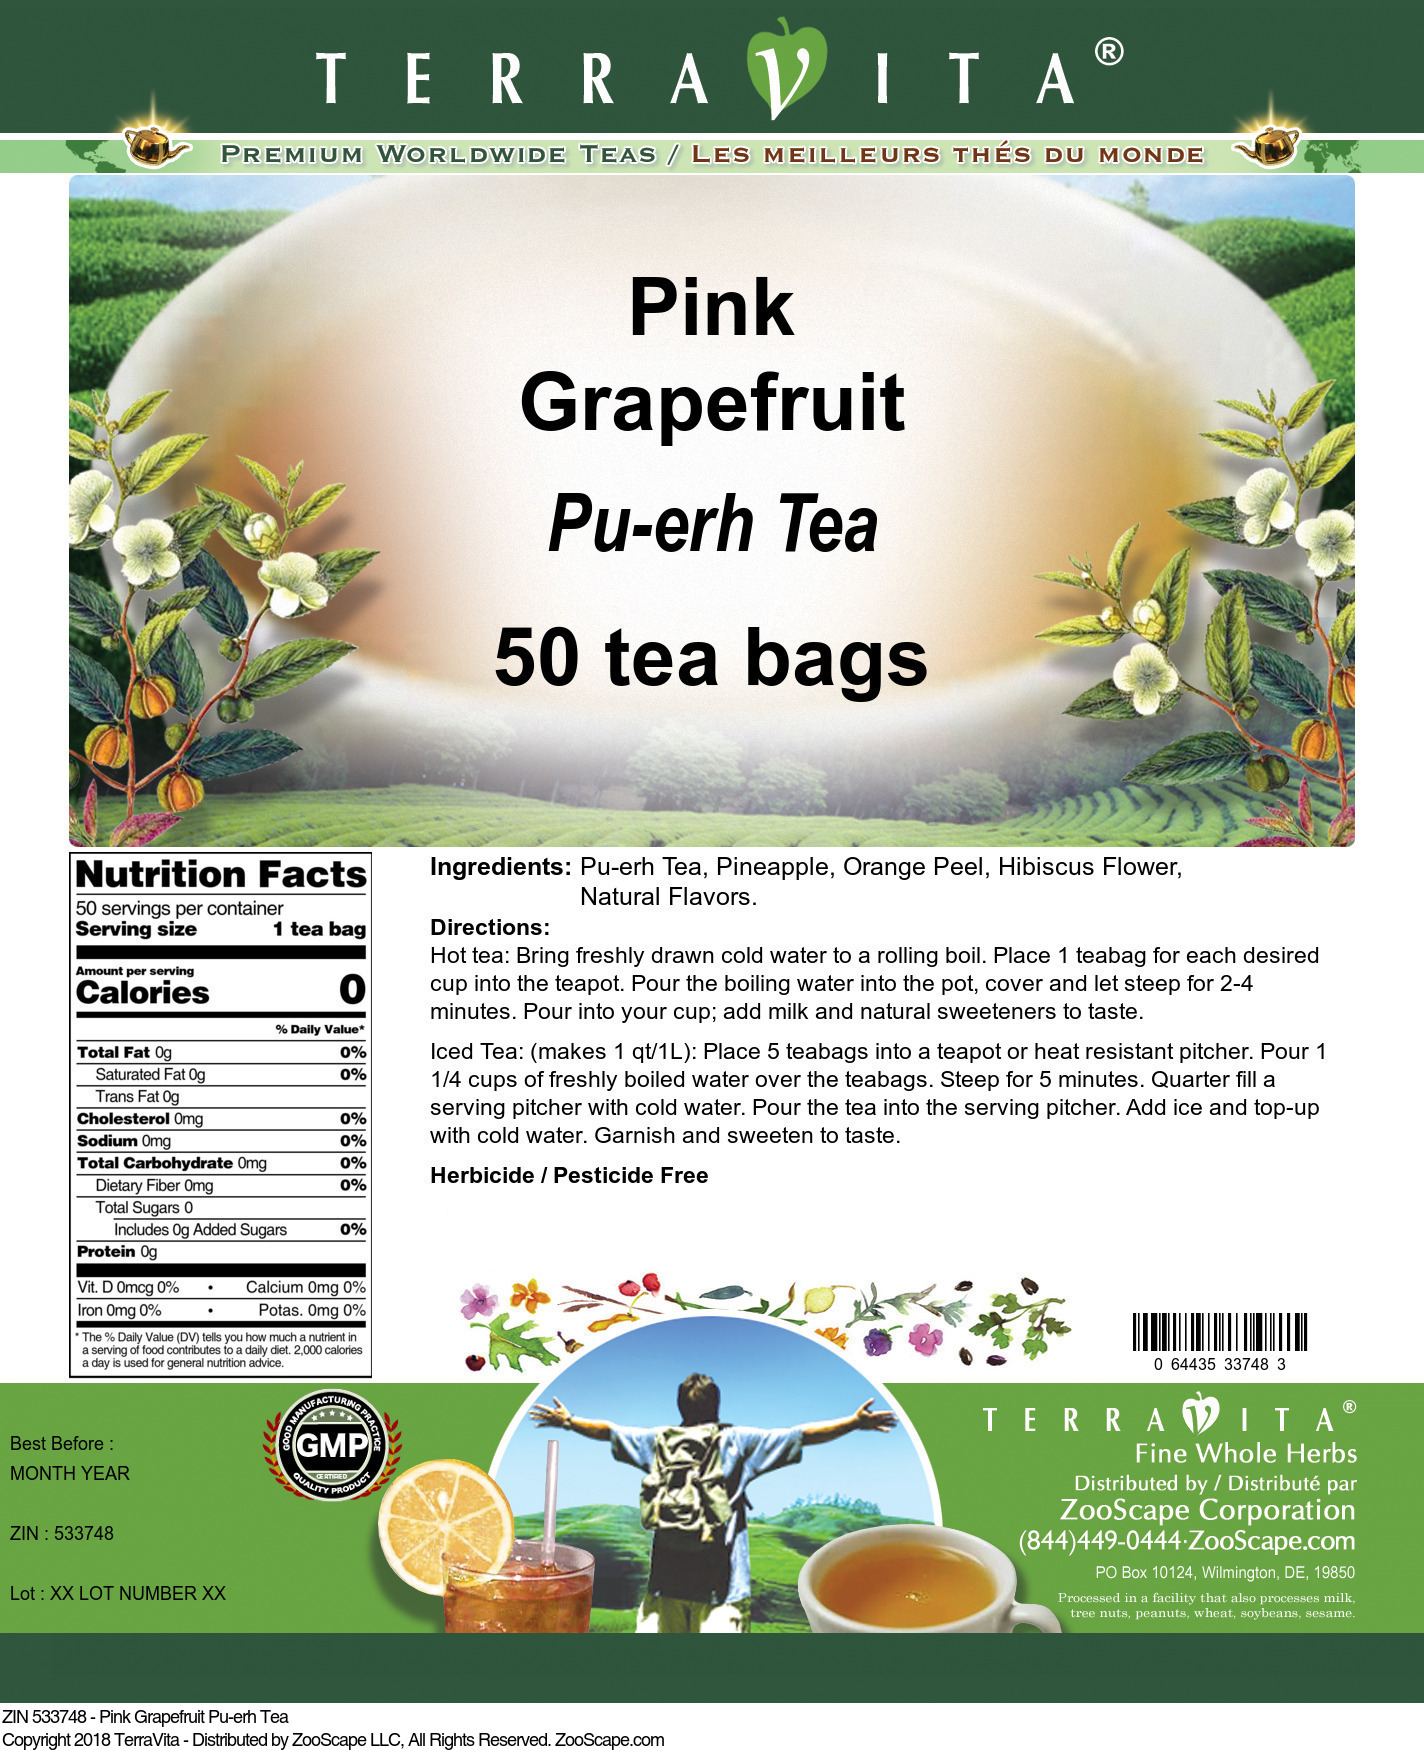 Pink Grapefruit Pu-erh Tea